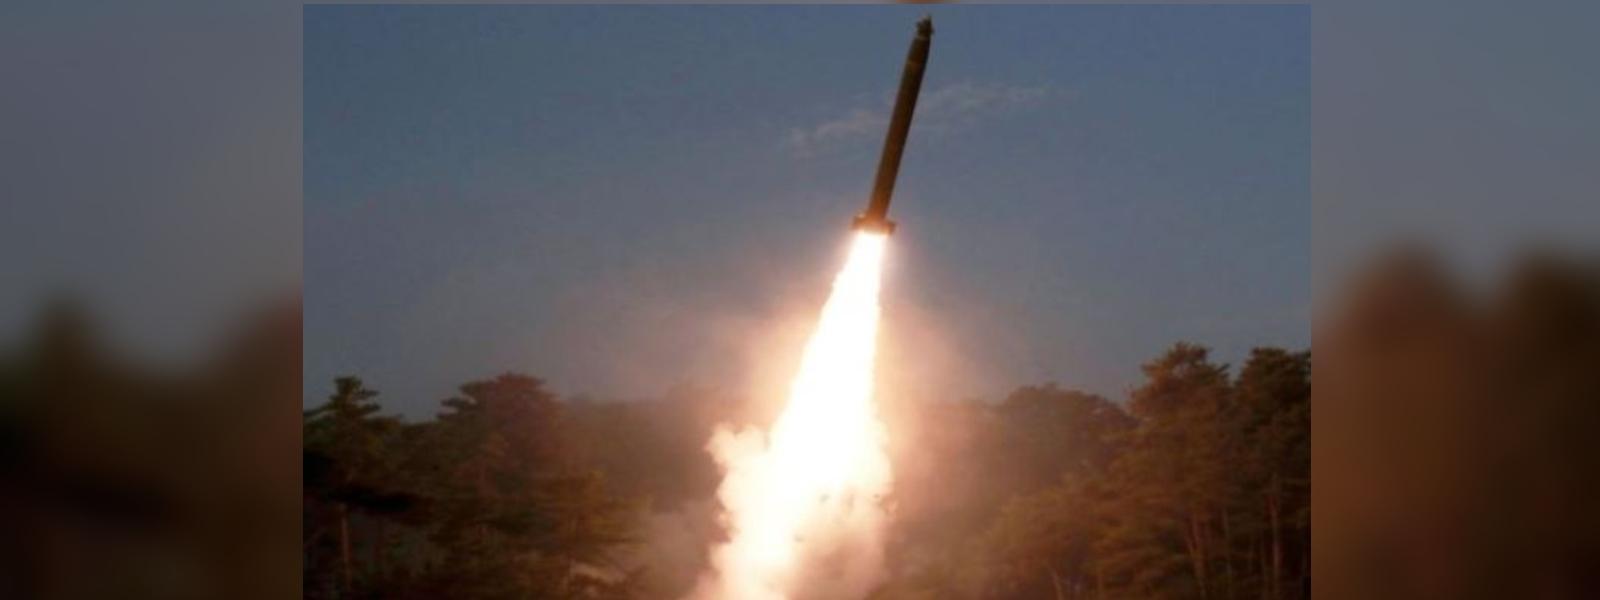 Global Coronavirus outbreak; North Korea fires two projectiles into sea